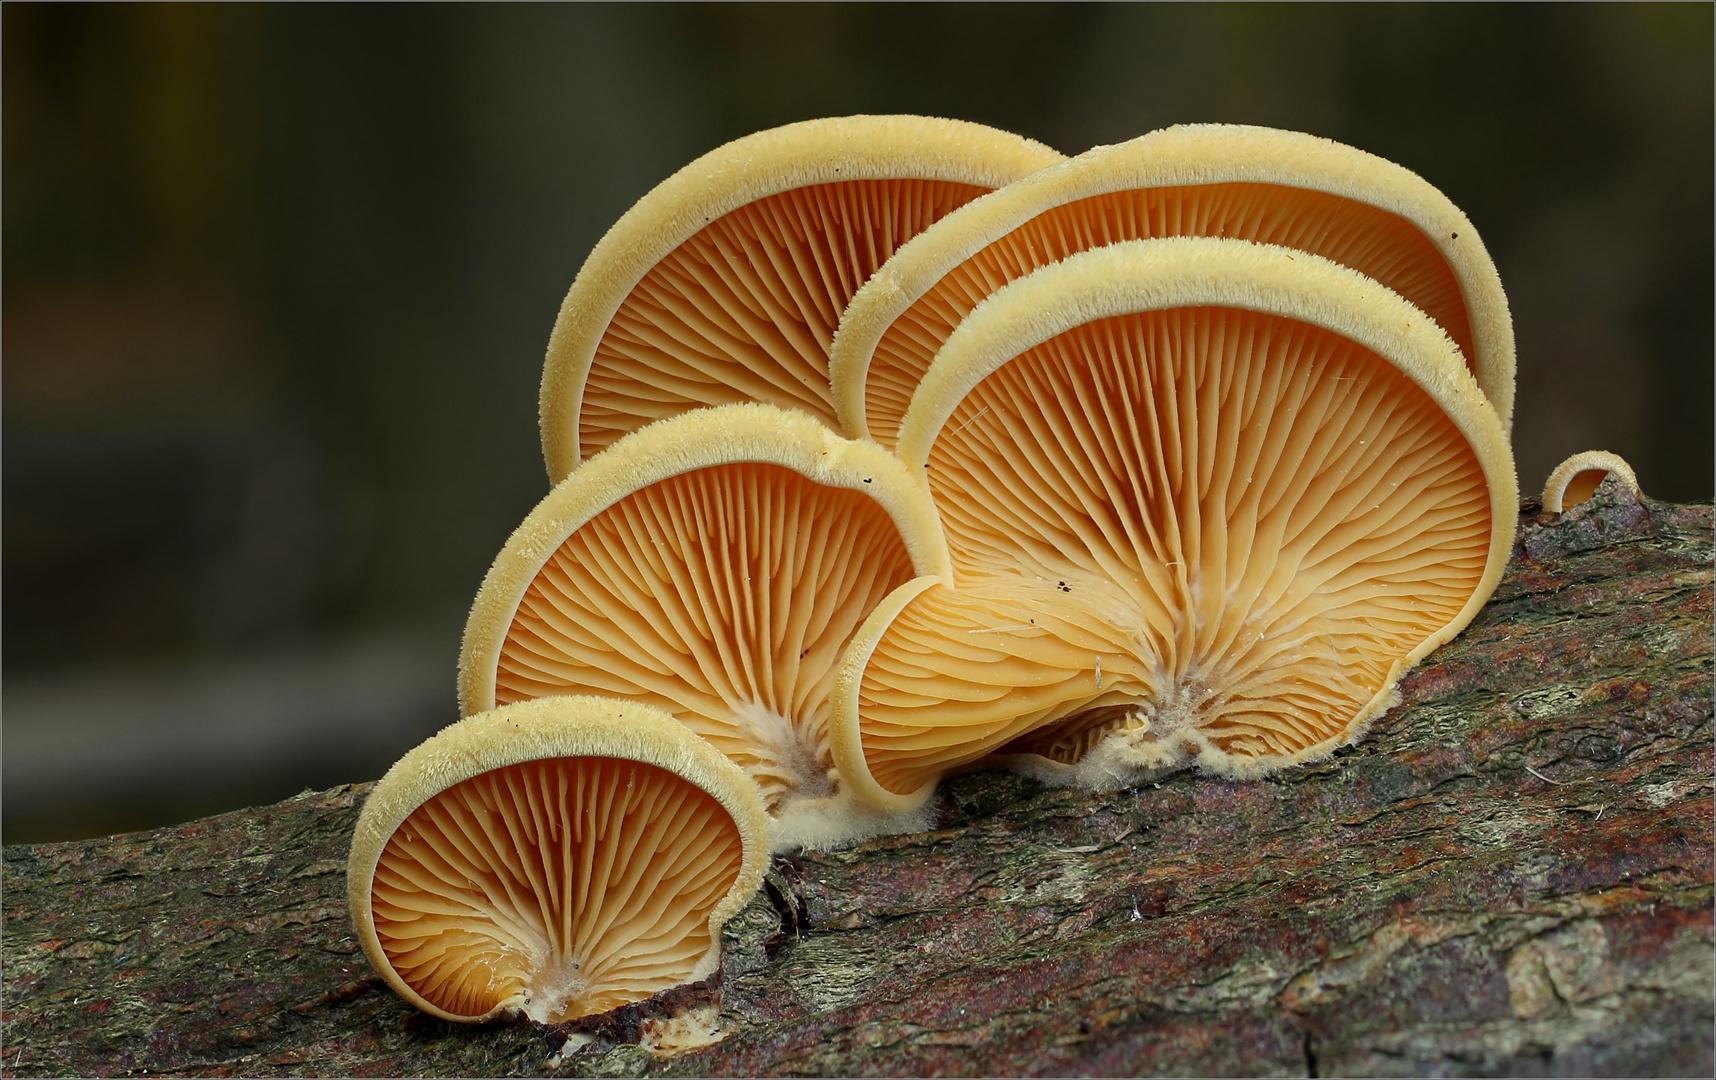 Orangeseitling (Phyllotopsis nidulanss)